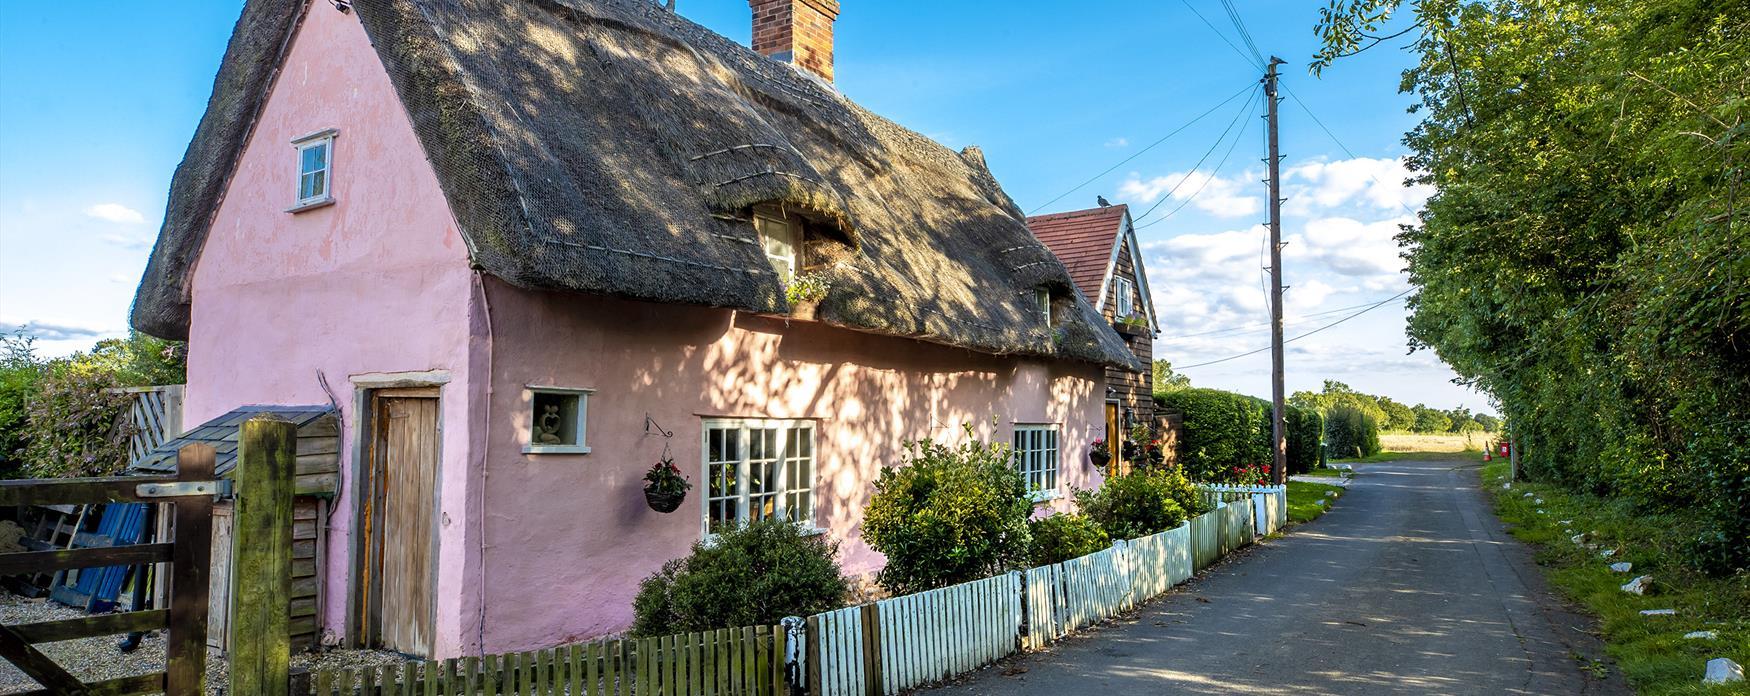 Pentalow cottage